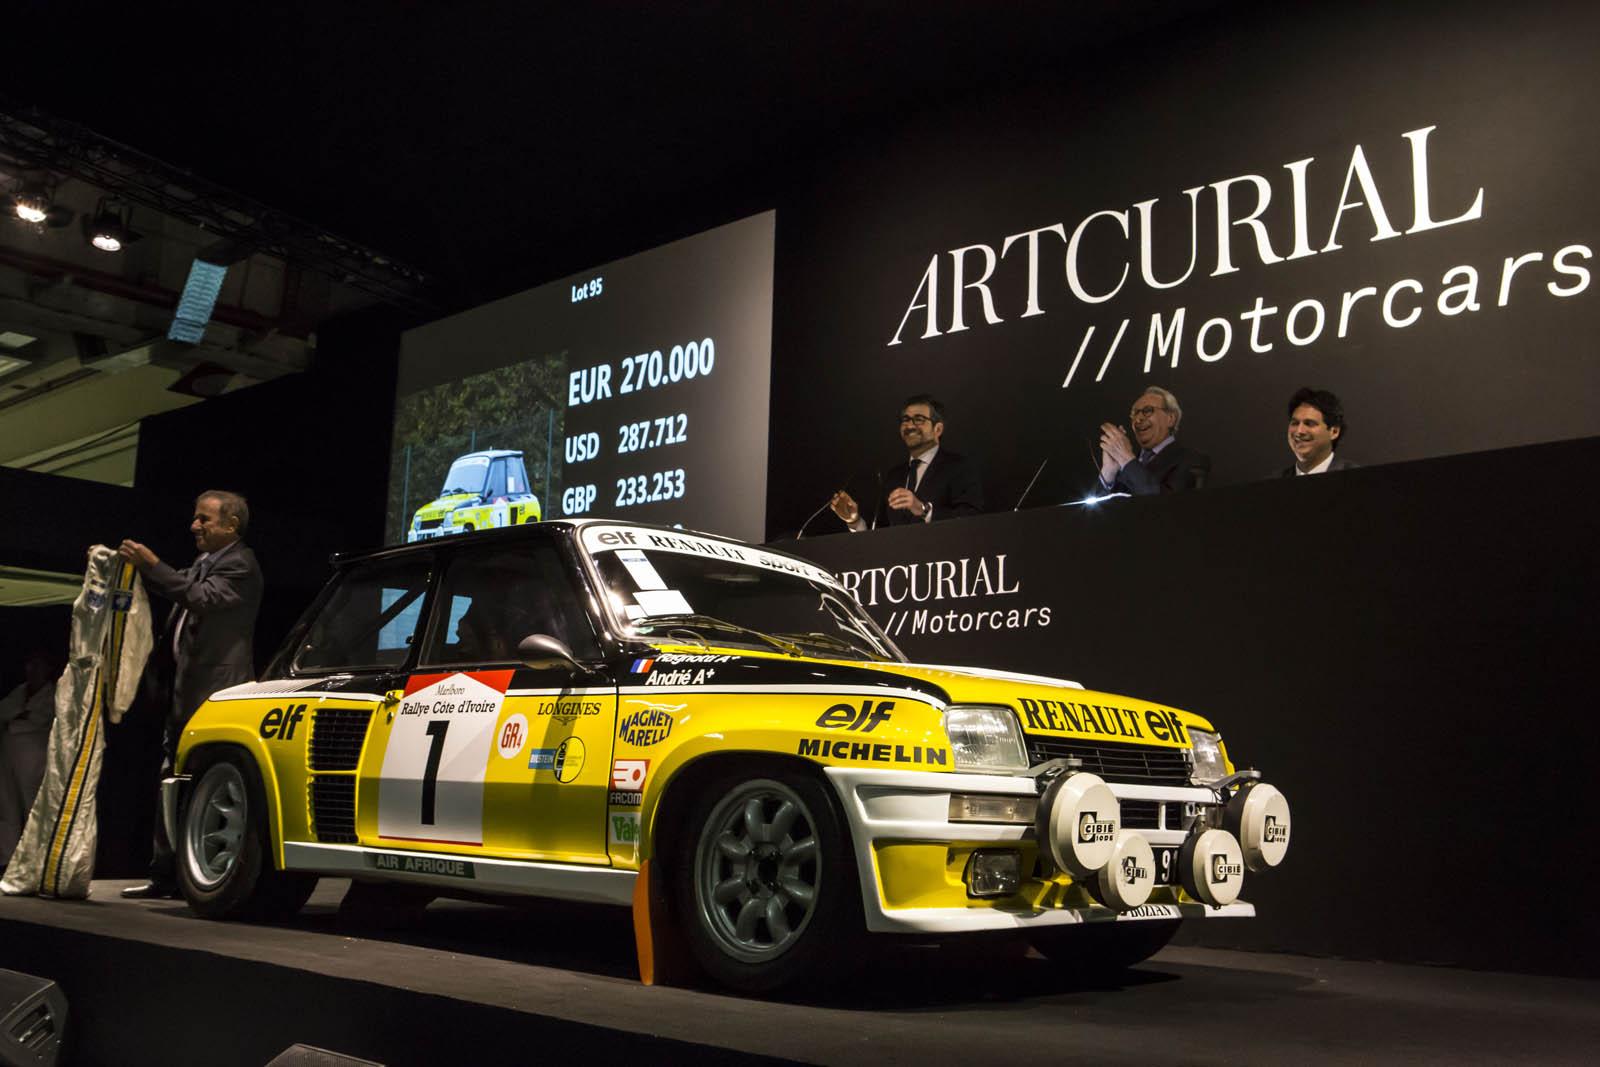 Lot+95_3+1982+Renault+5+Turbo+Groupe+4+%C2%A9Artcurial+copy